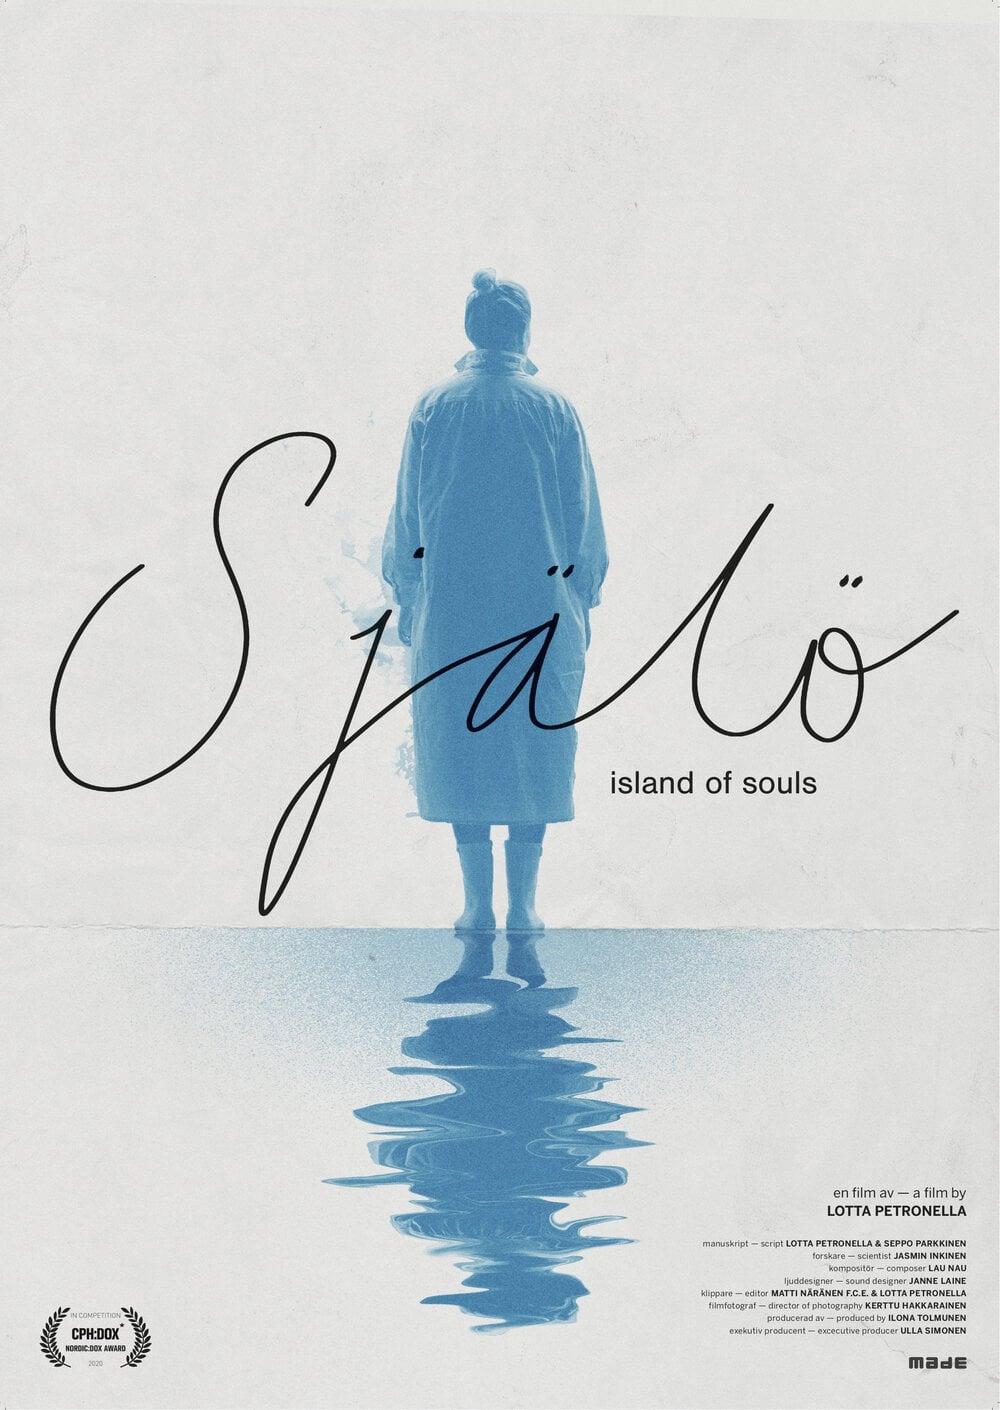 Själö - Island of Souls